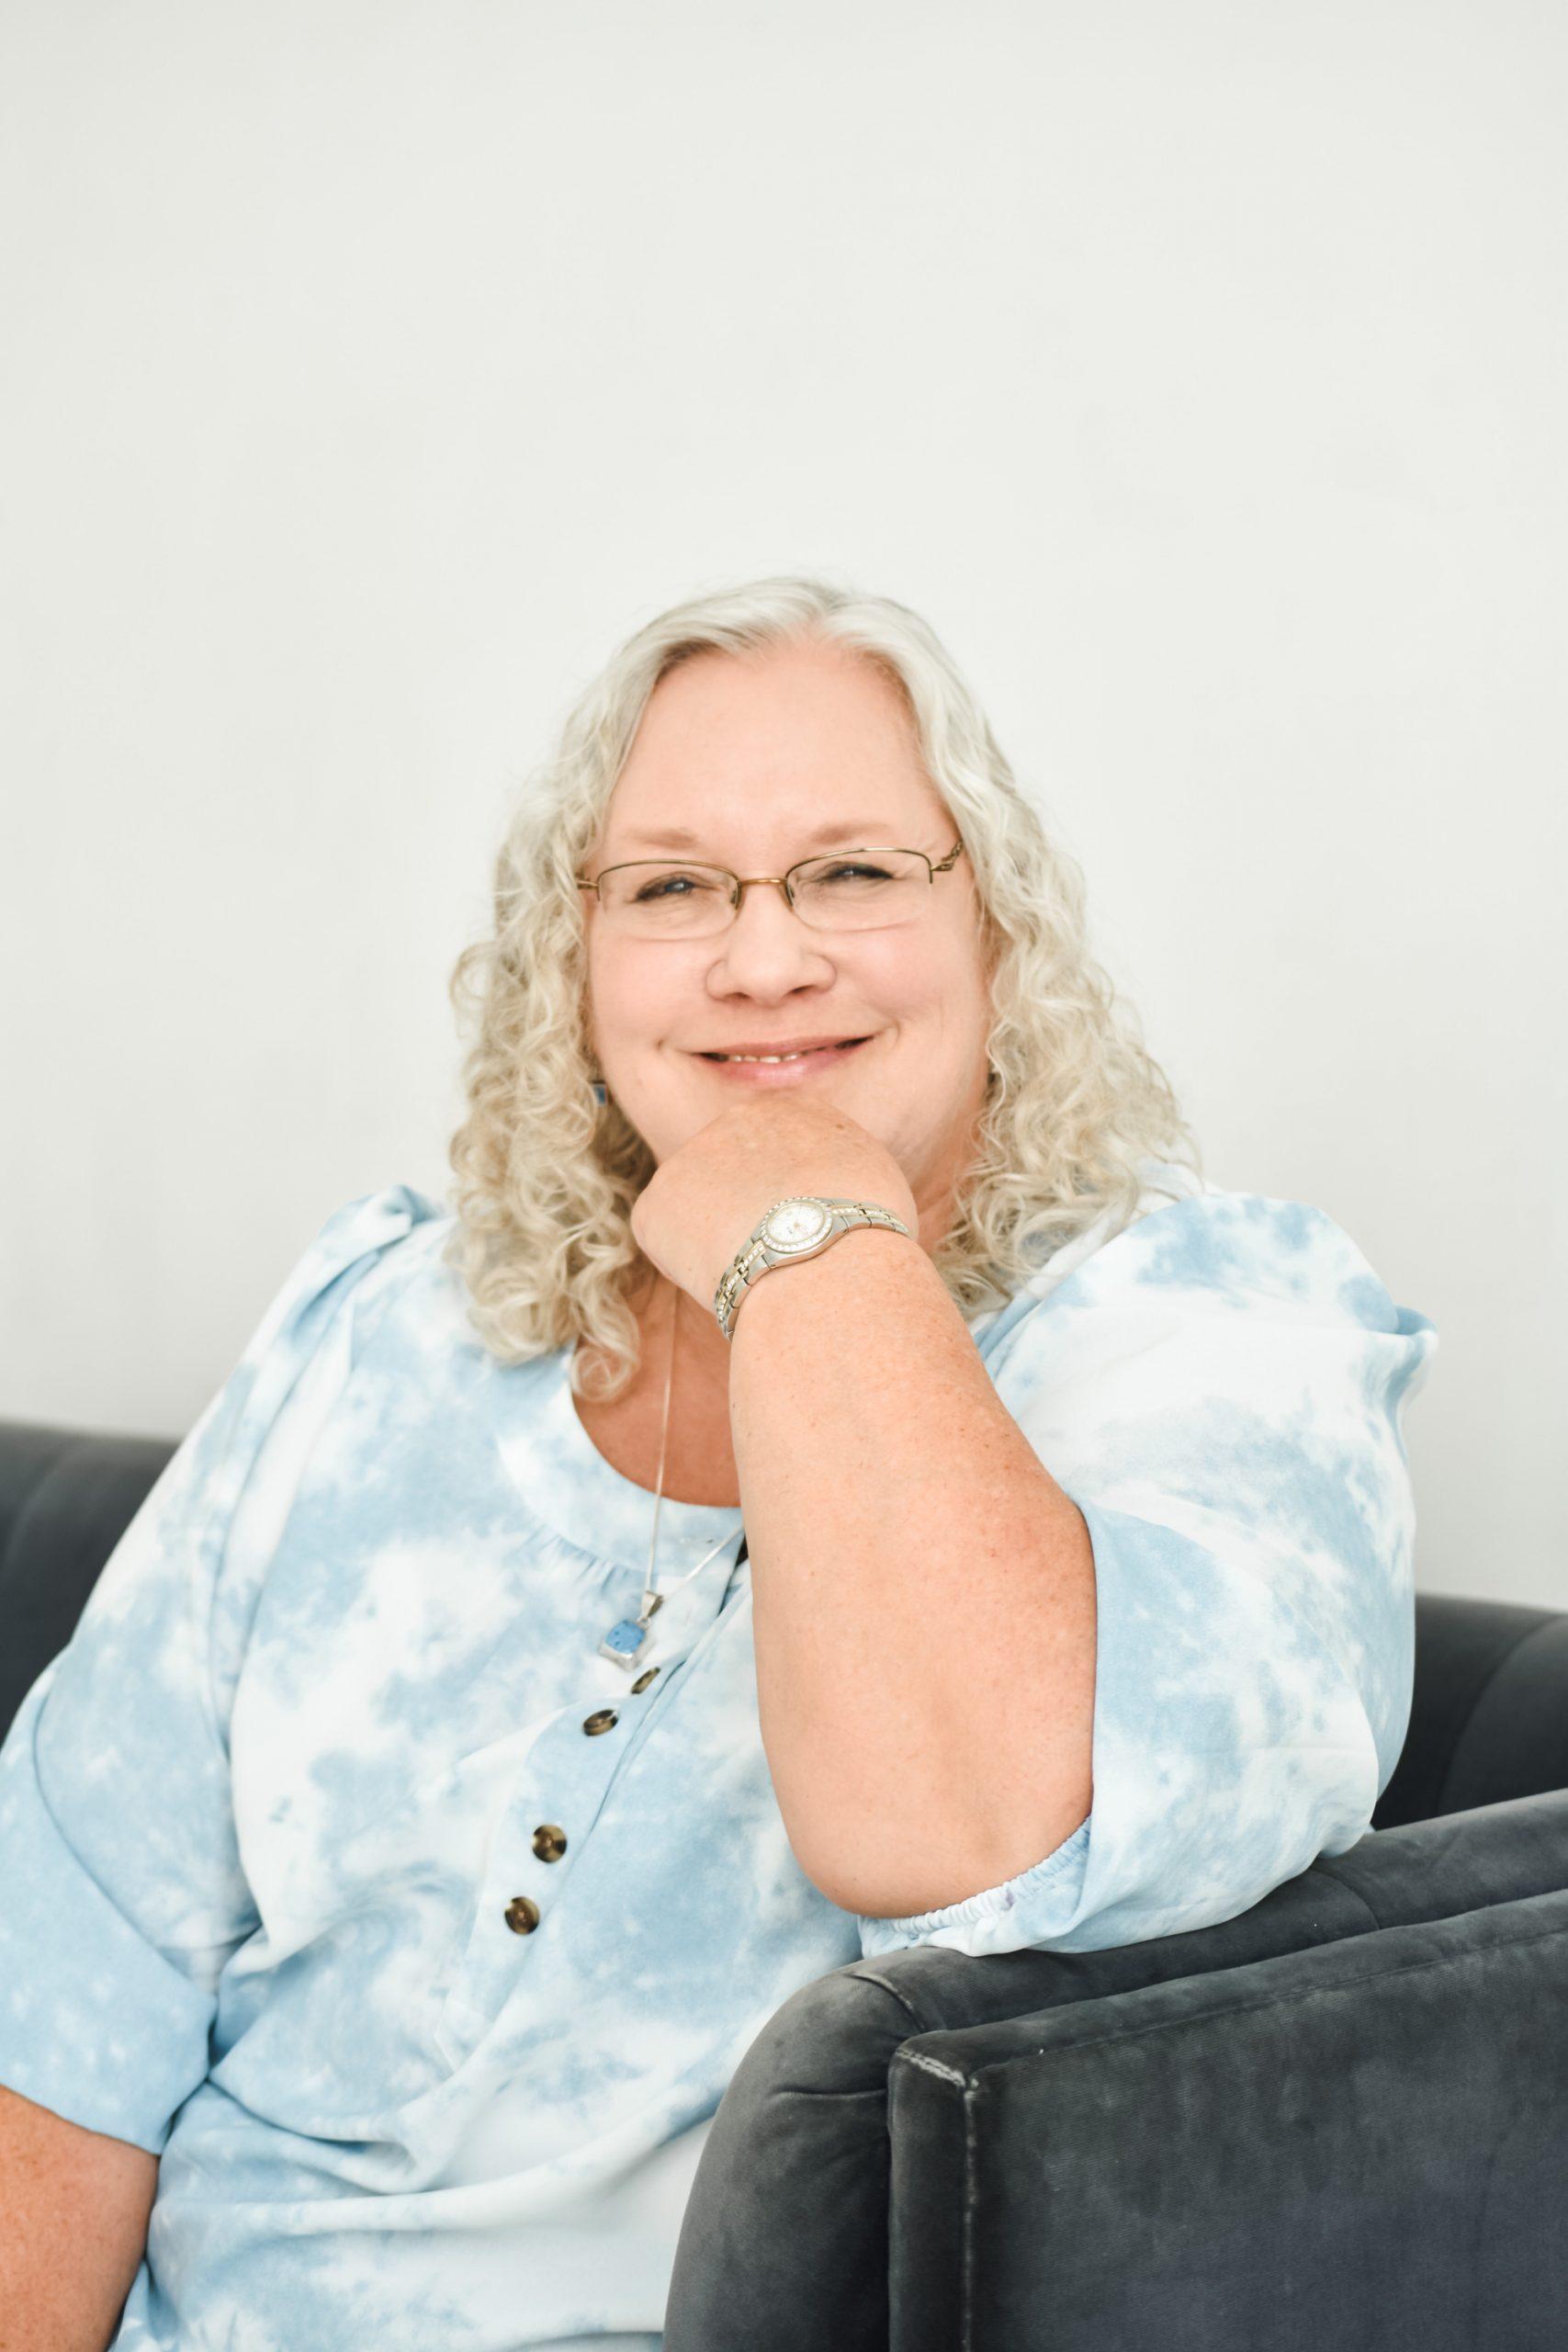 Kimberly Nielsen, LPC-Associate Supervised by Felicia J. Holloway, PhD, LPC-S, LMFT-S